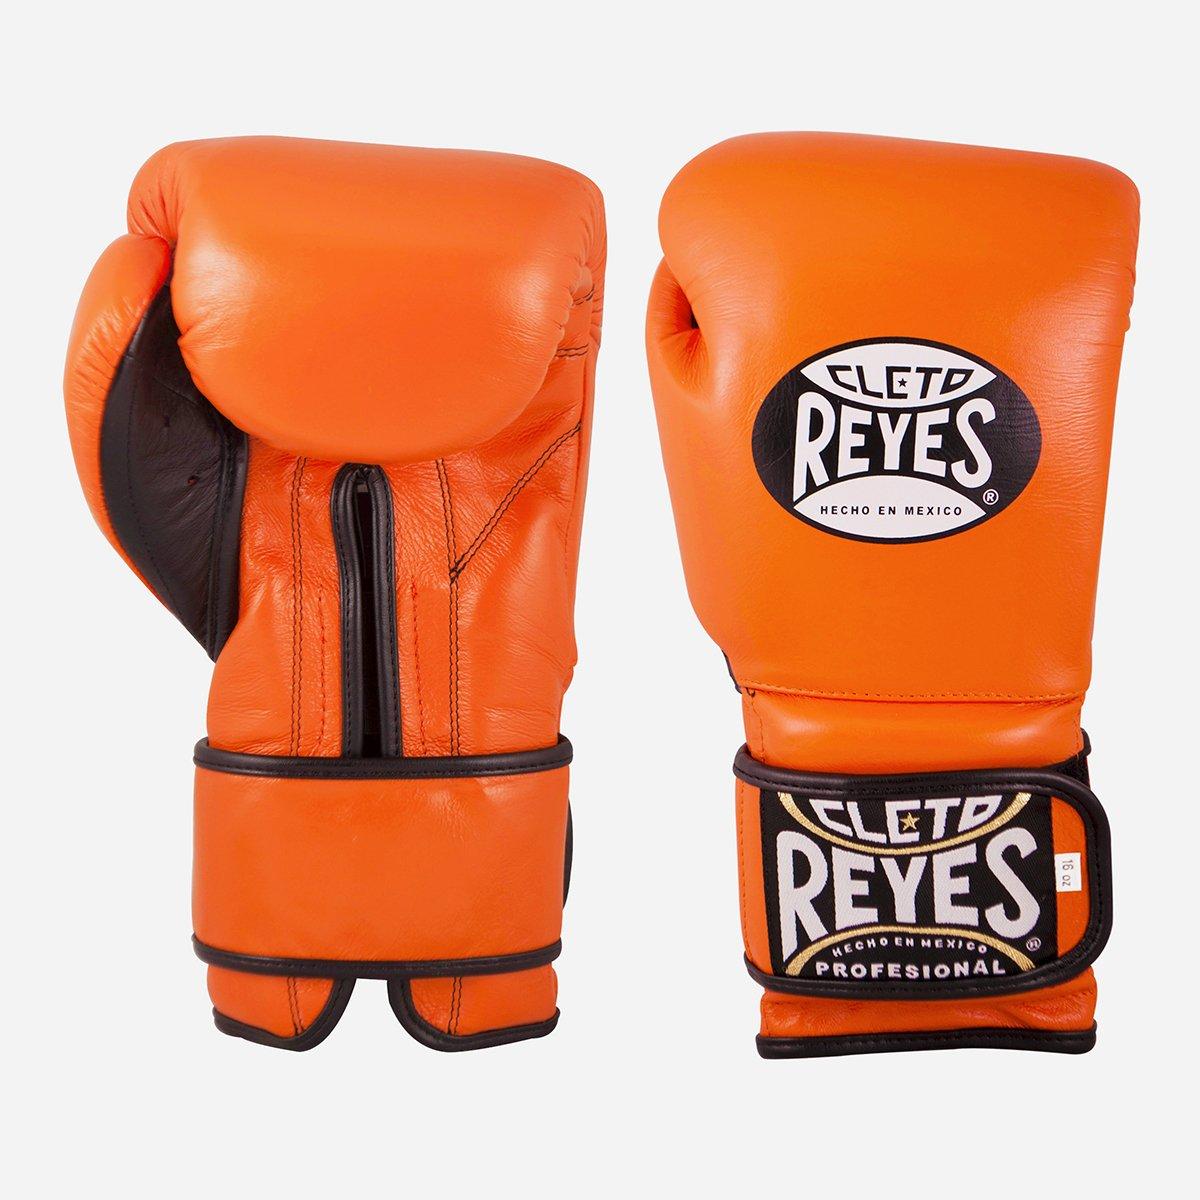 Cleto Reyes Hook and Loop Leather Training Boxing Gloves - 12 oz. - Tiger Orange